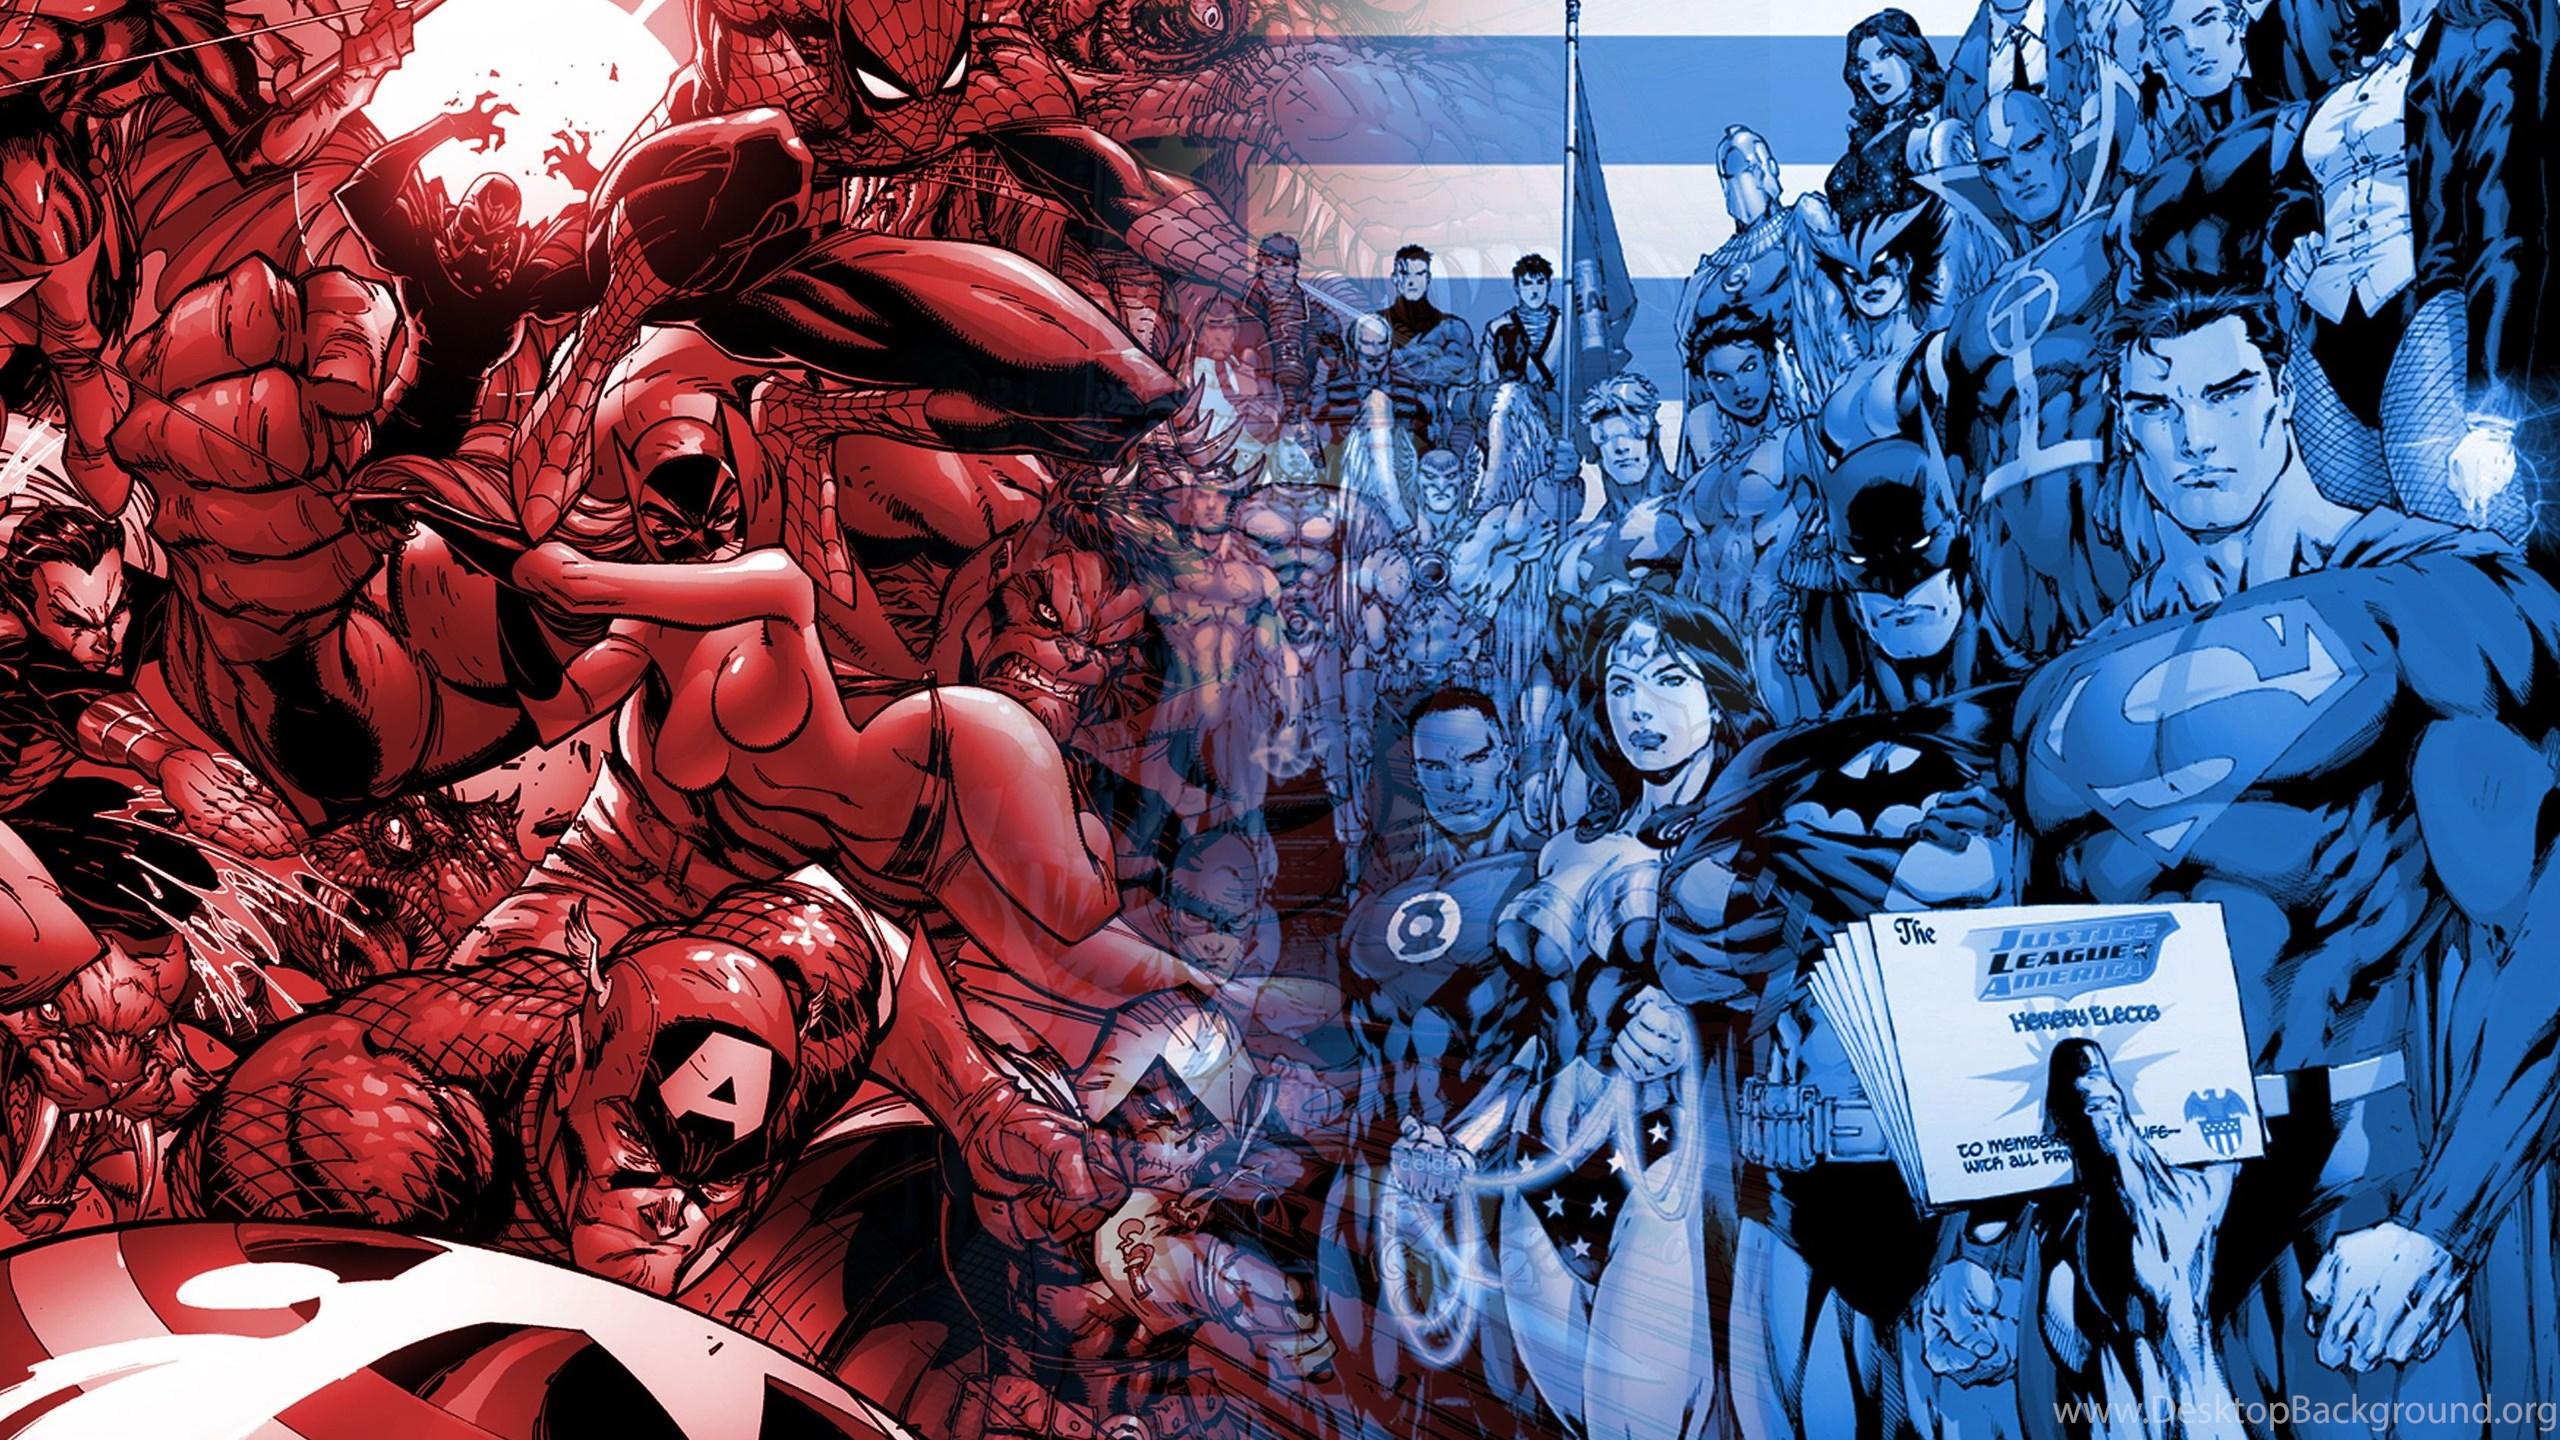 Theres No Winner When Race Marvel Vs DC Desktop